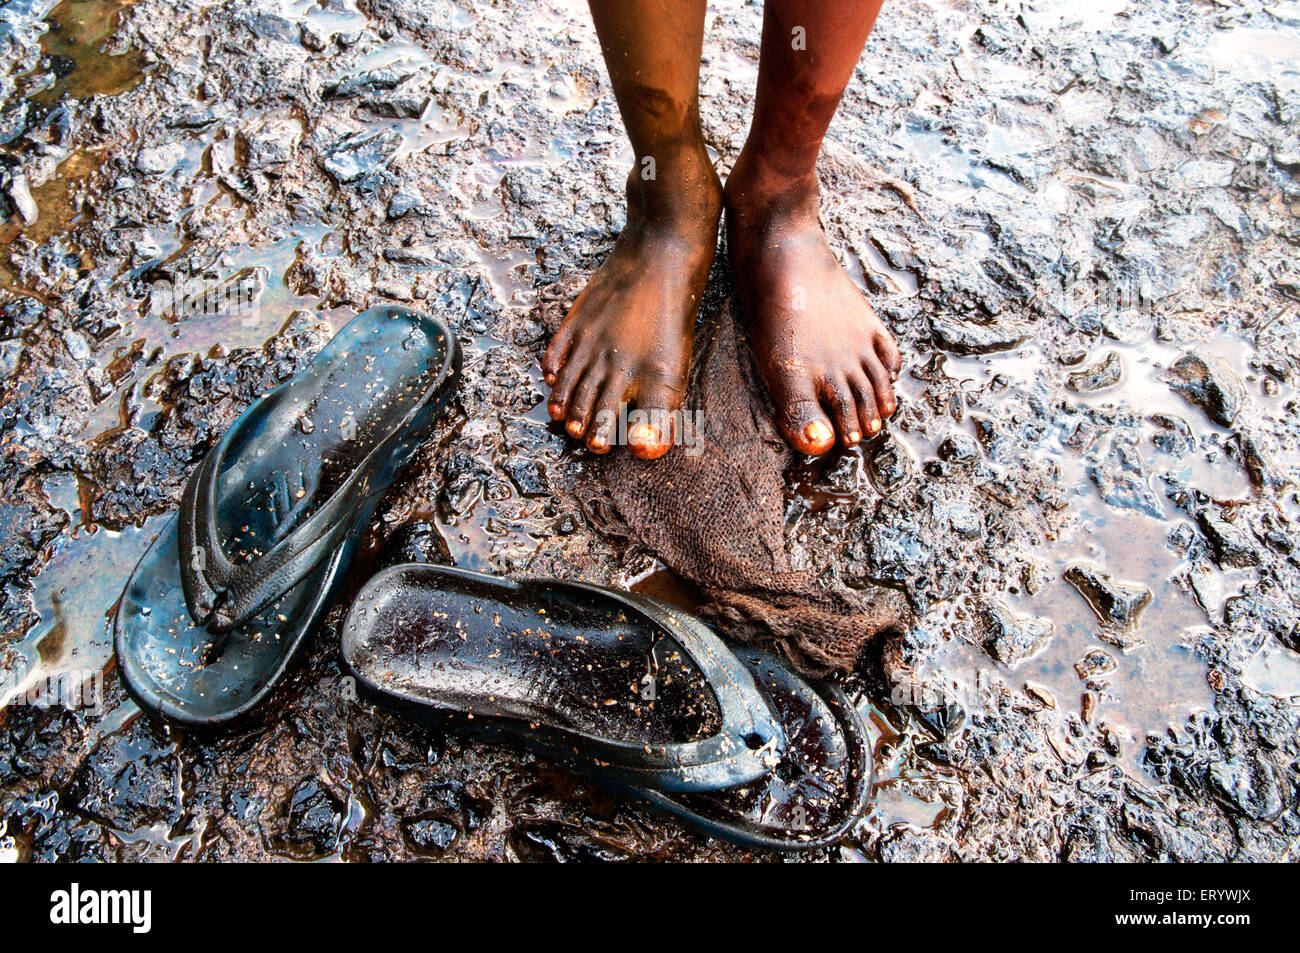 Boy showing oil soaked feet  due to container ship chitra colliding in sea Bombay Mumbai ; Maharashtra ; India - Stock Image